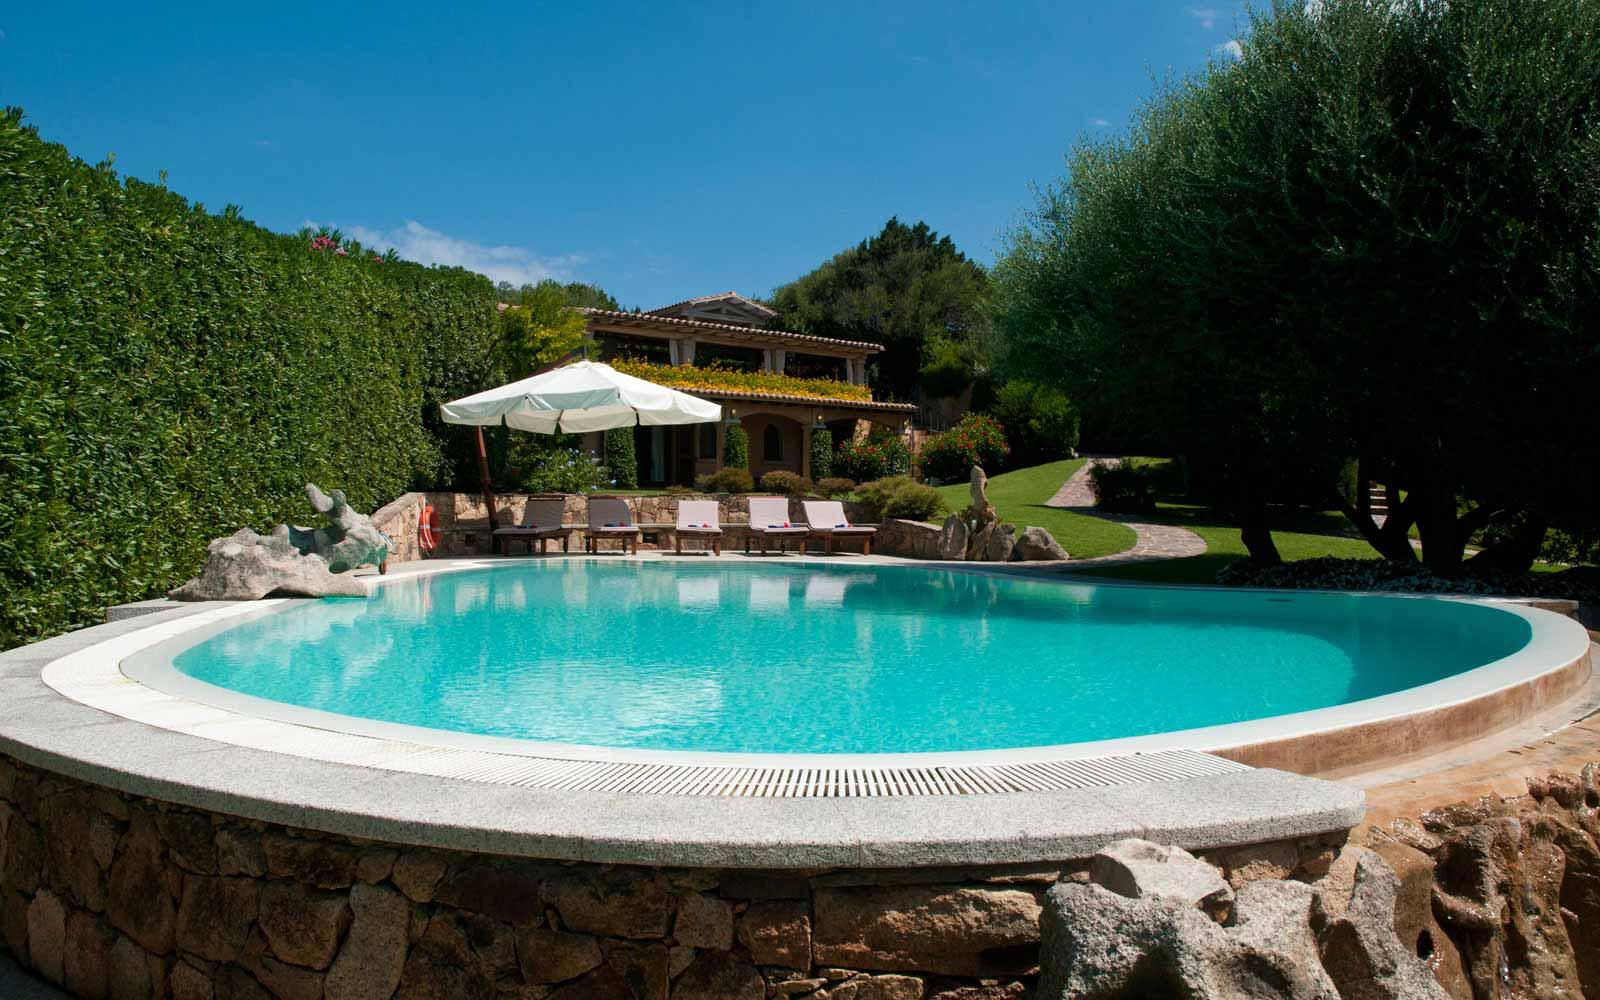 Swimming pool at Villa Pedrabianca